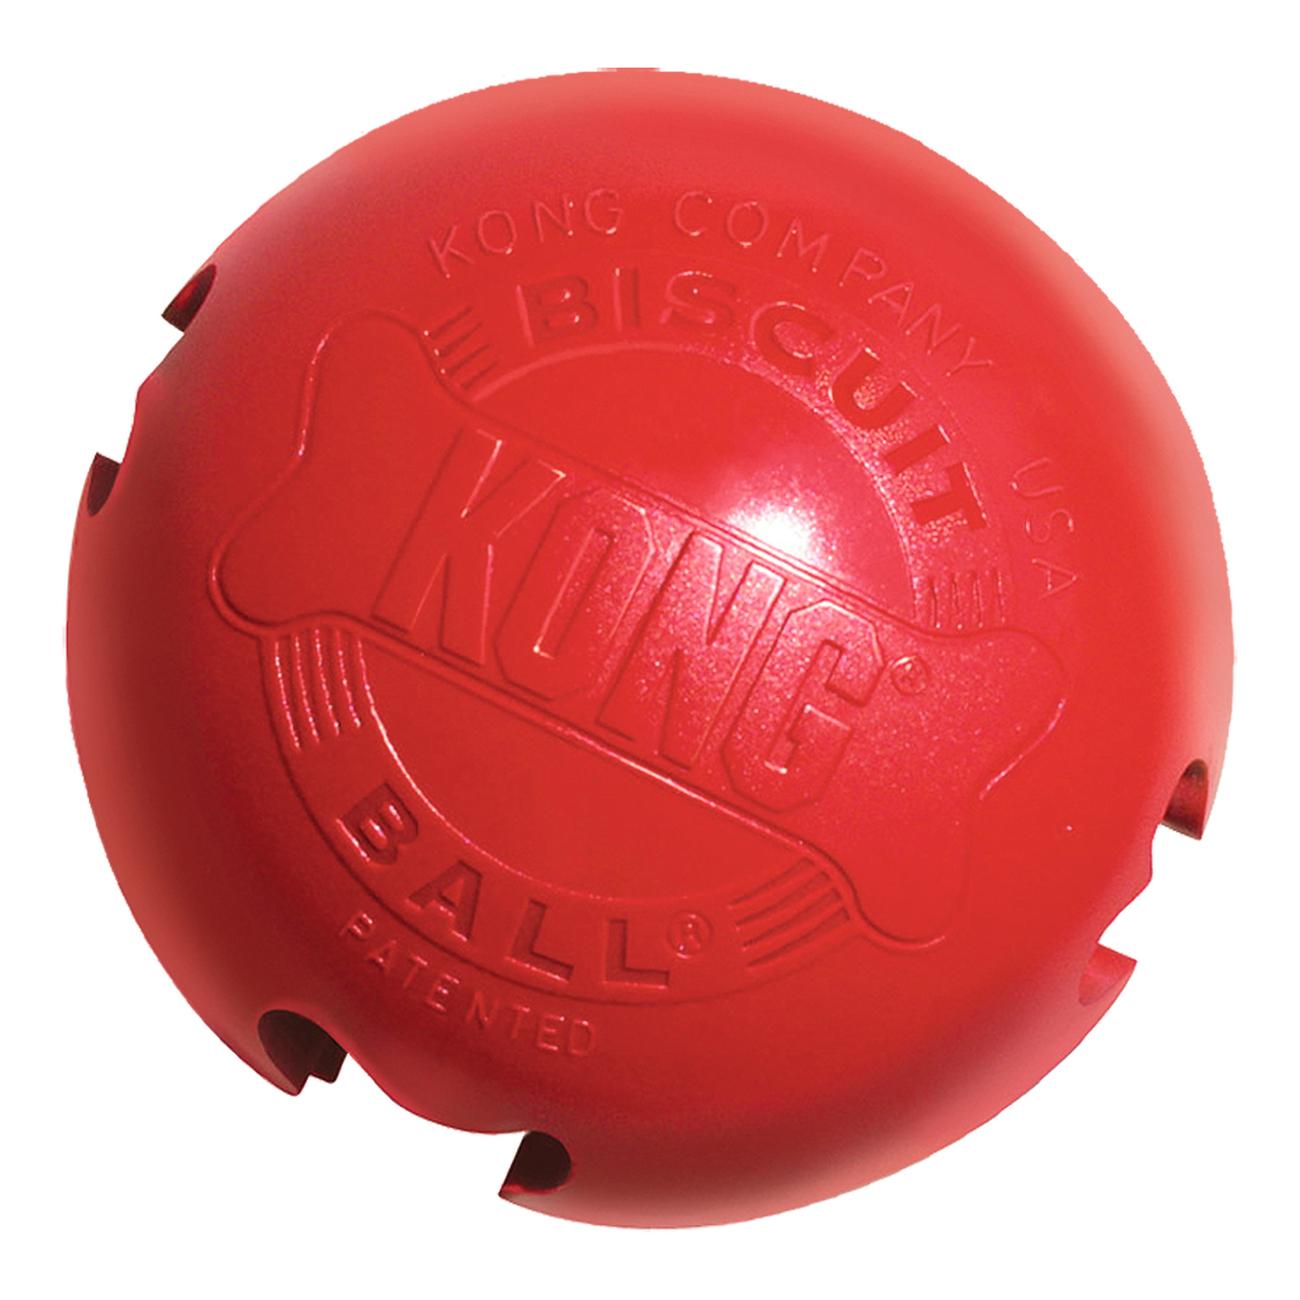 KONG Biscuit Ball Hundespielzeug, Bild 4